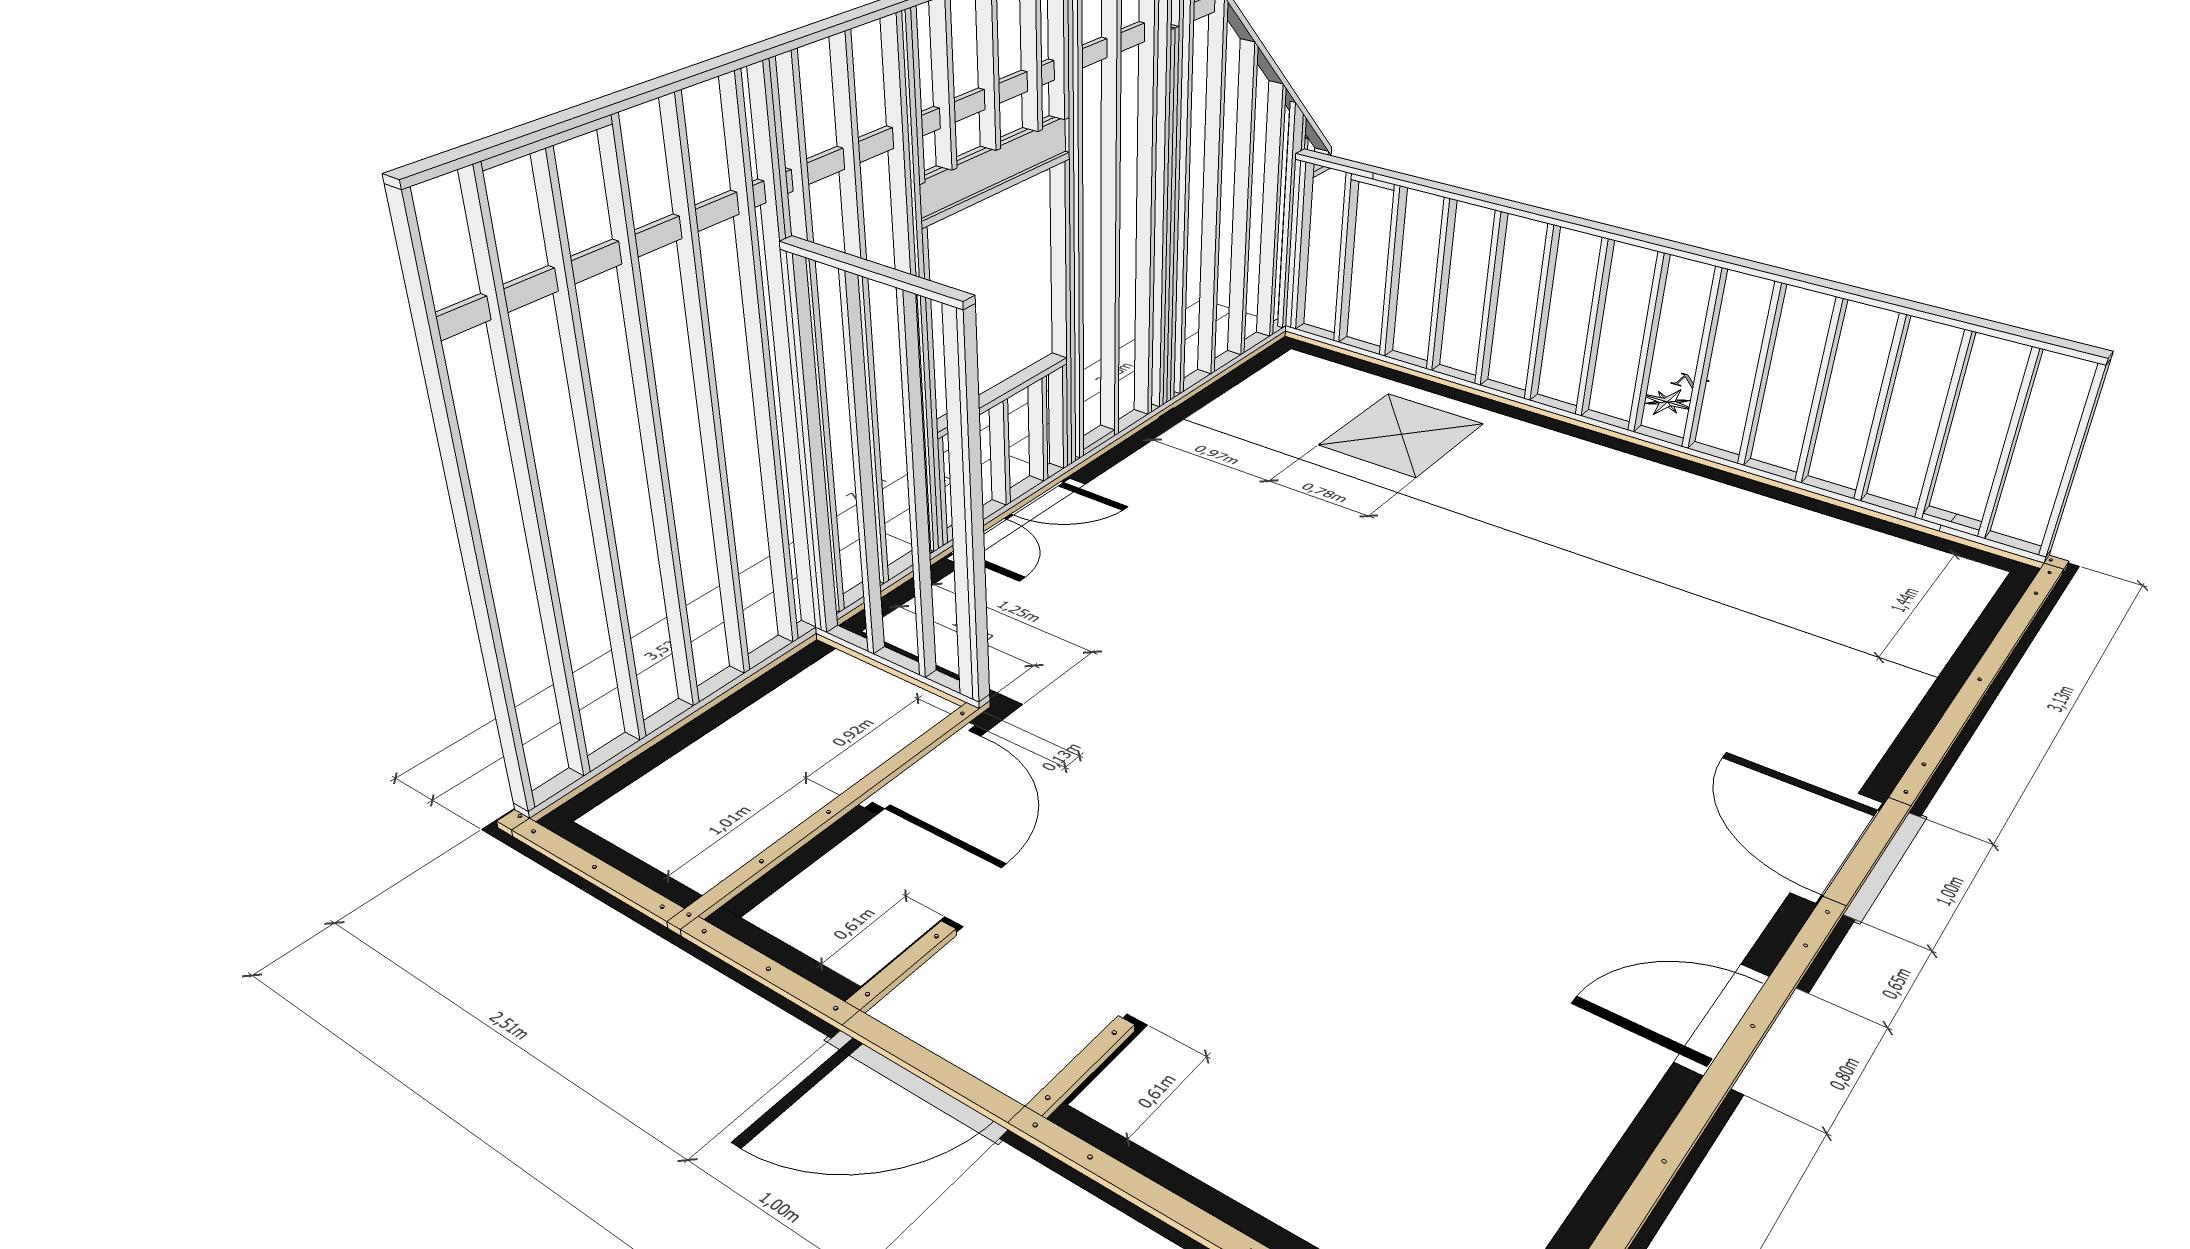 Dtu maison ossature bois avie home for Construction en bois livre